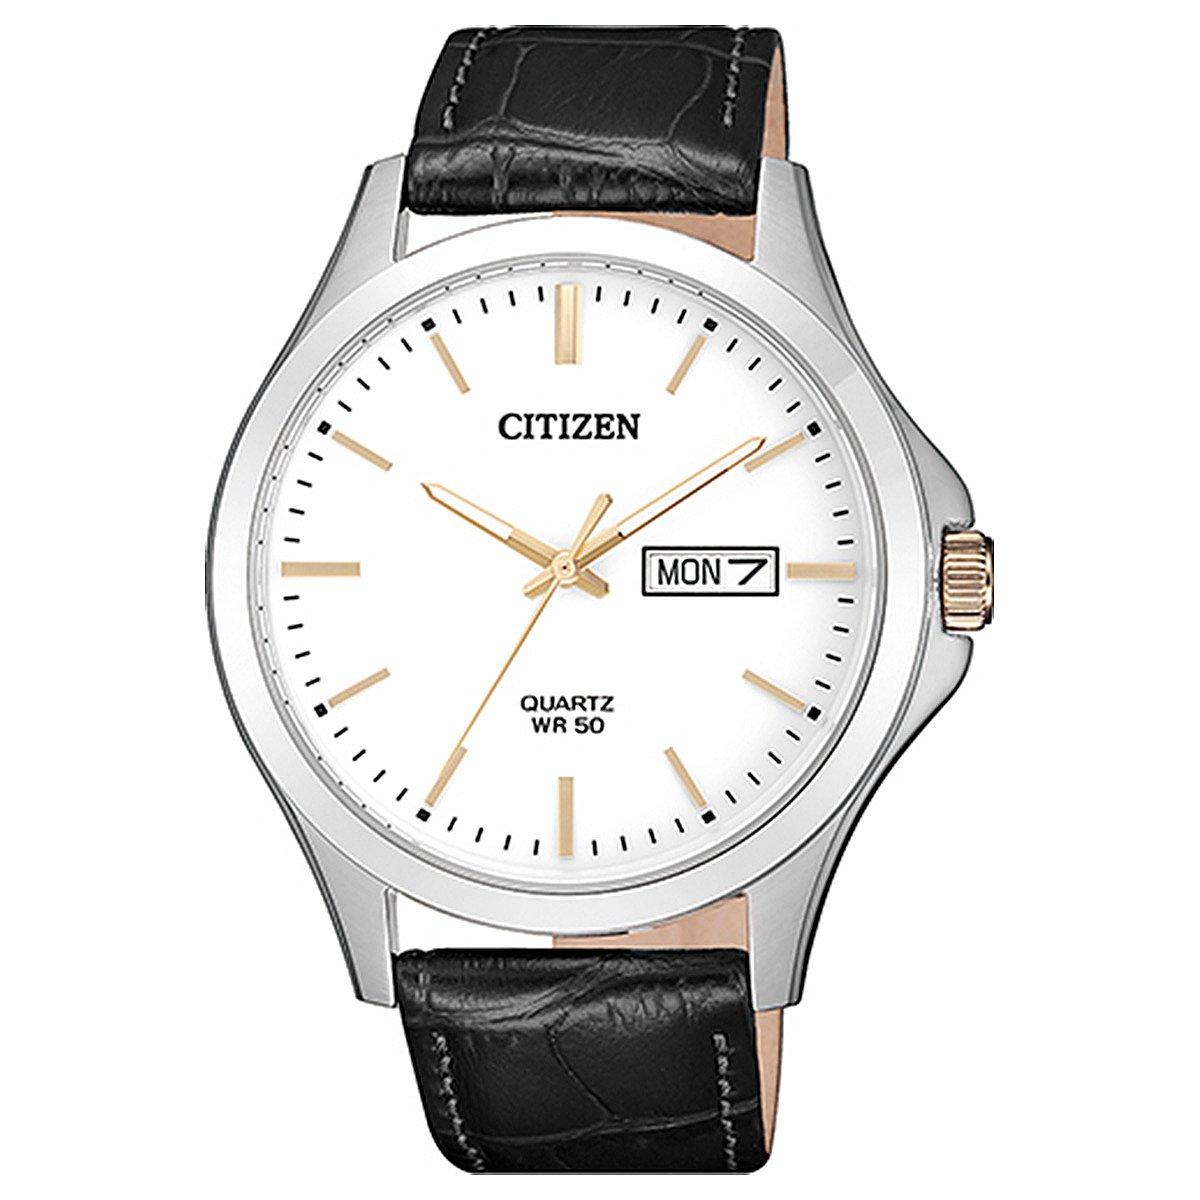 5f982697446 Relógio Citizen Analógico TZ20822B Masculino